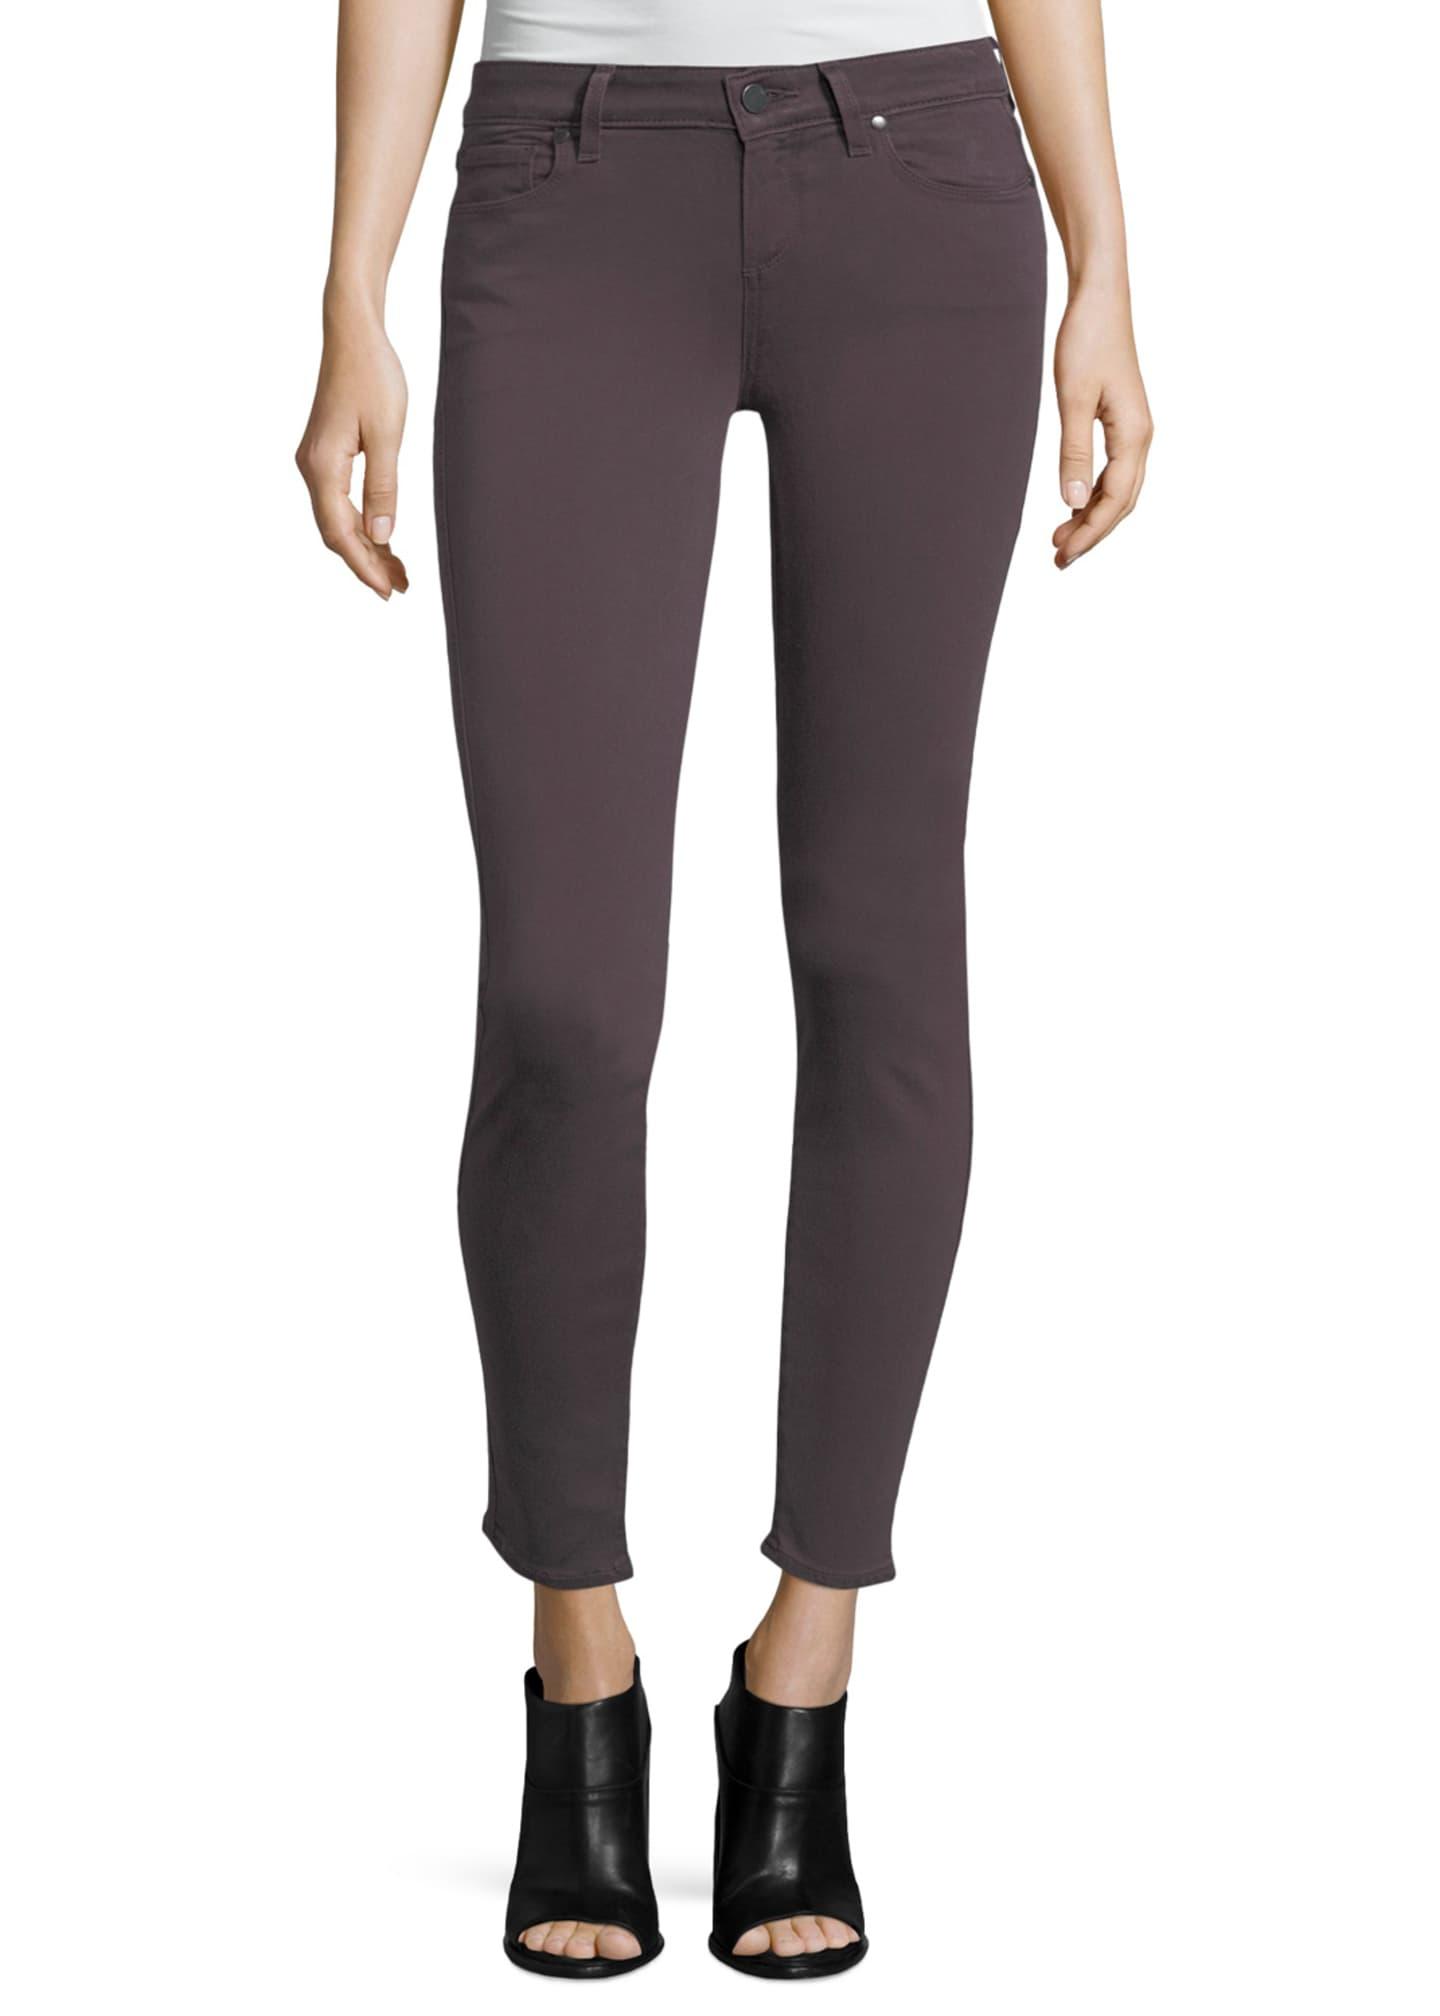 PAIGE Verdugo Skinny Ankle Jeans